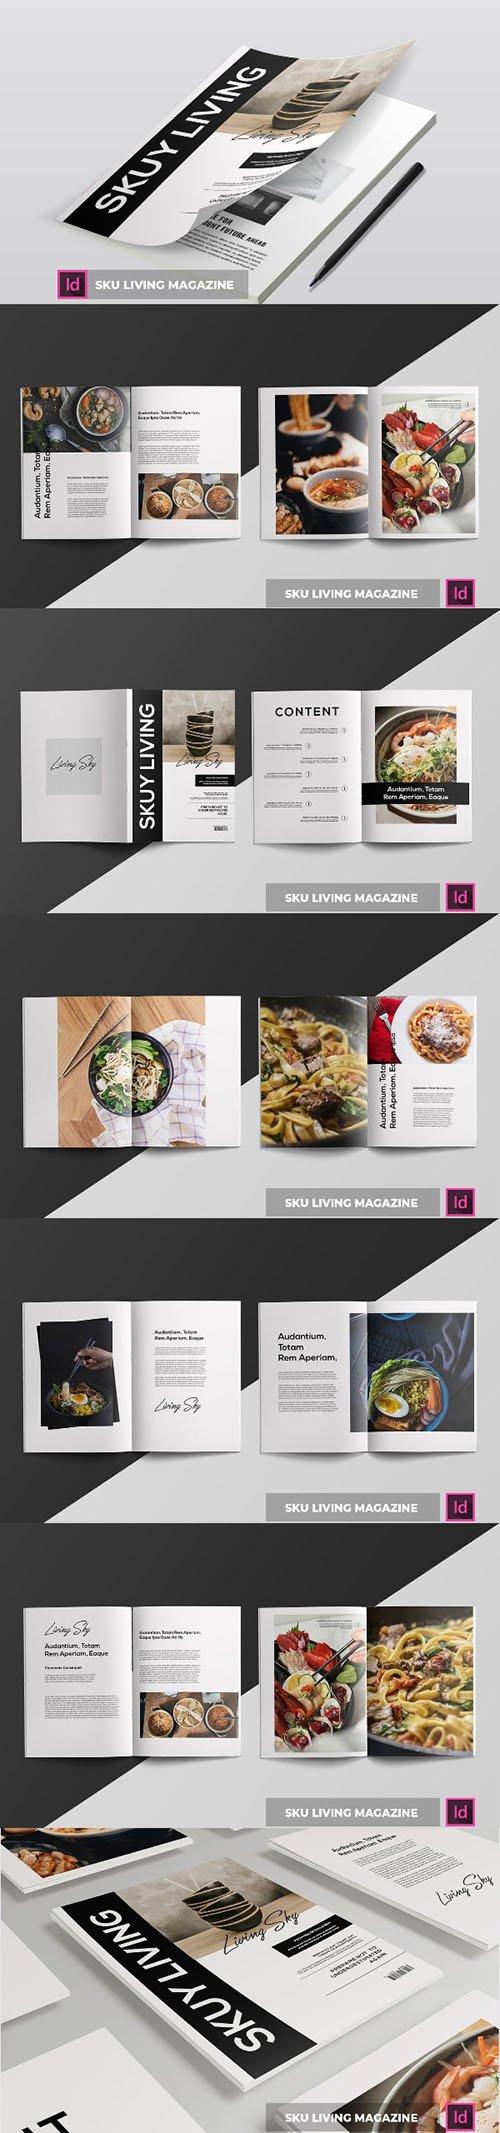 Sku Iiving ssss | Magazine Template